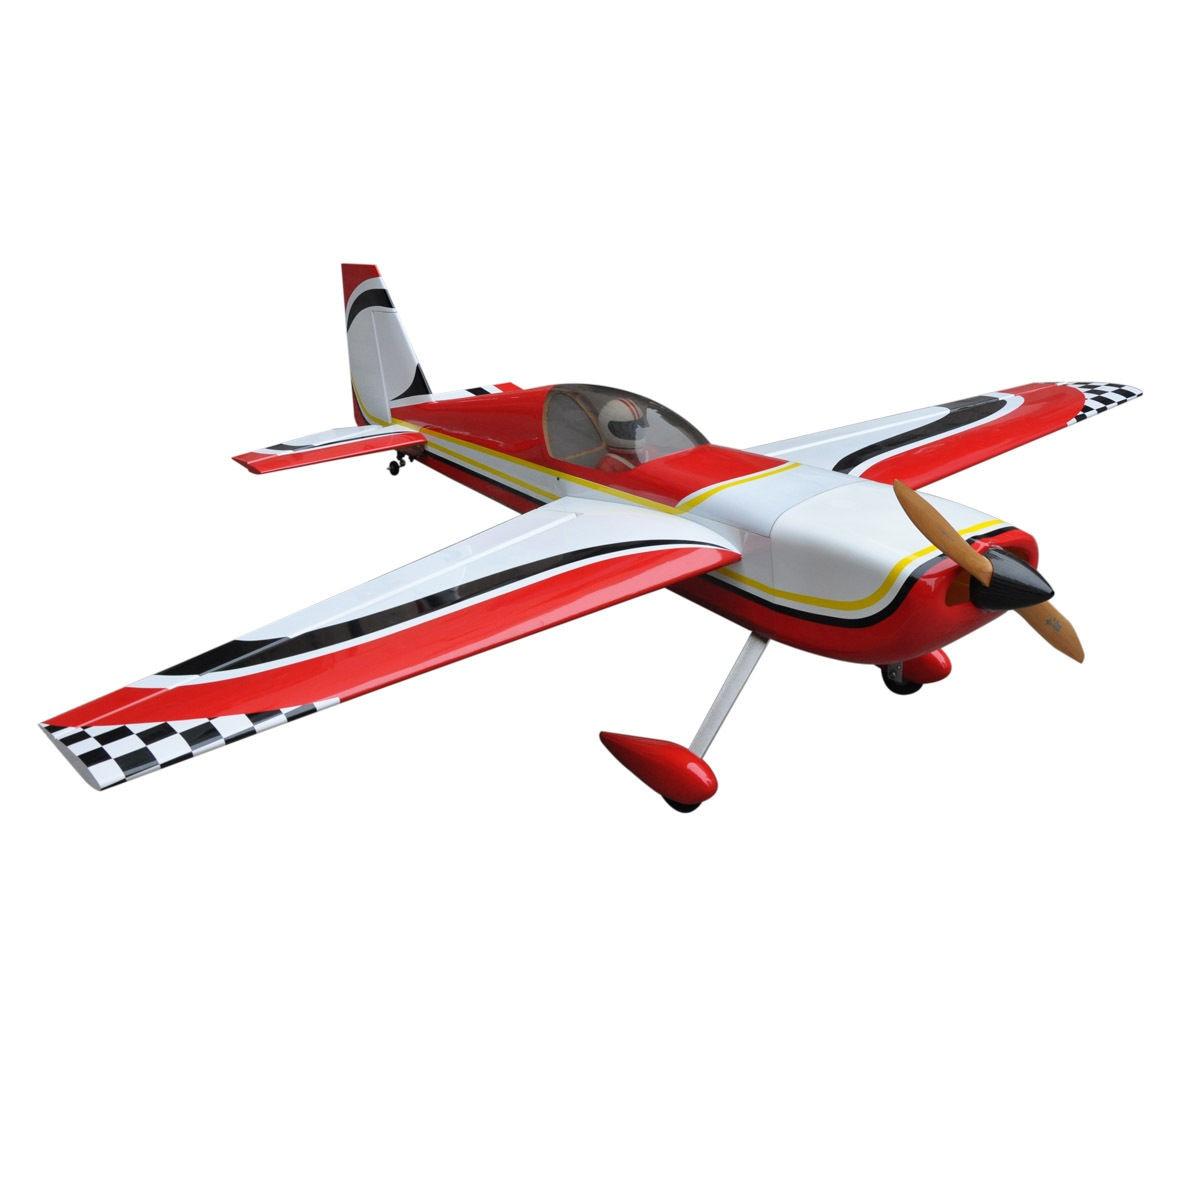 Balsa Wood Extra 260 87inch 2204mm 50CC Gas Airplane Radio control ARF AircraftBalsa Wood Extra 260 87inch 2204mm 50CC Gas Airplane Radio control ARF Aircraft